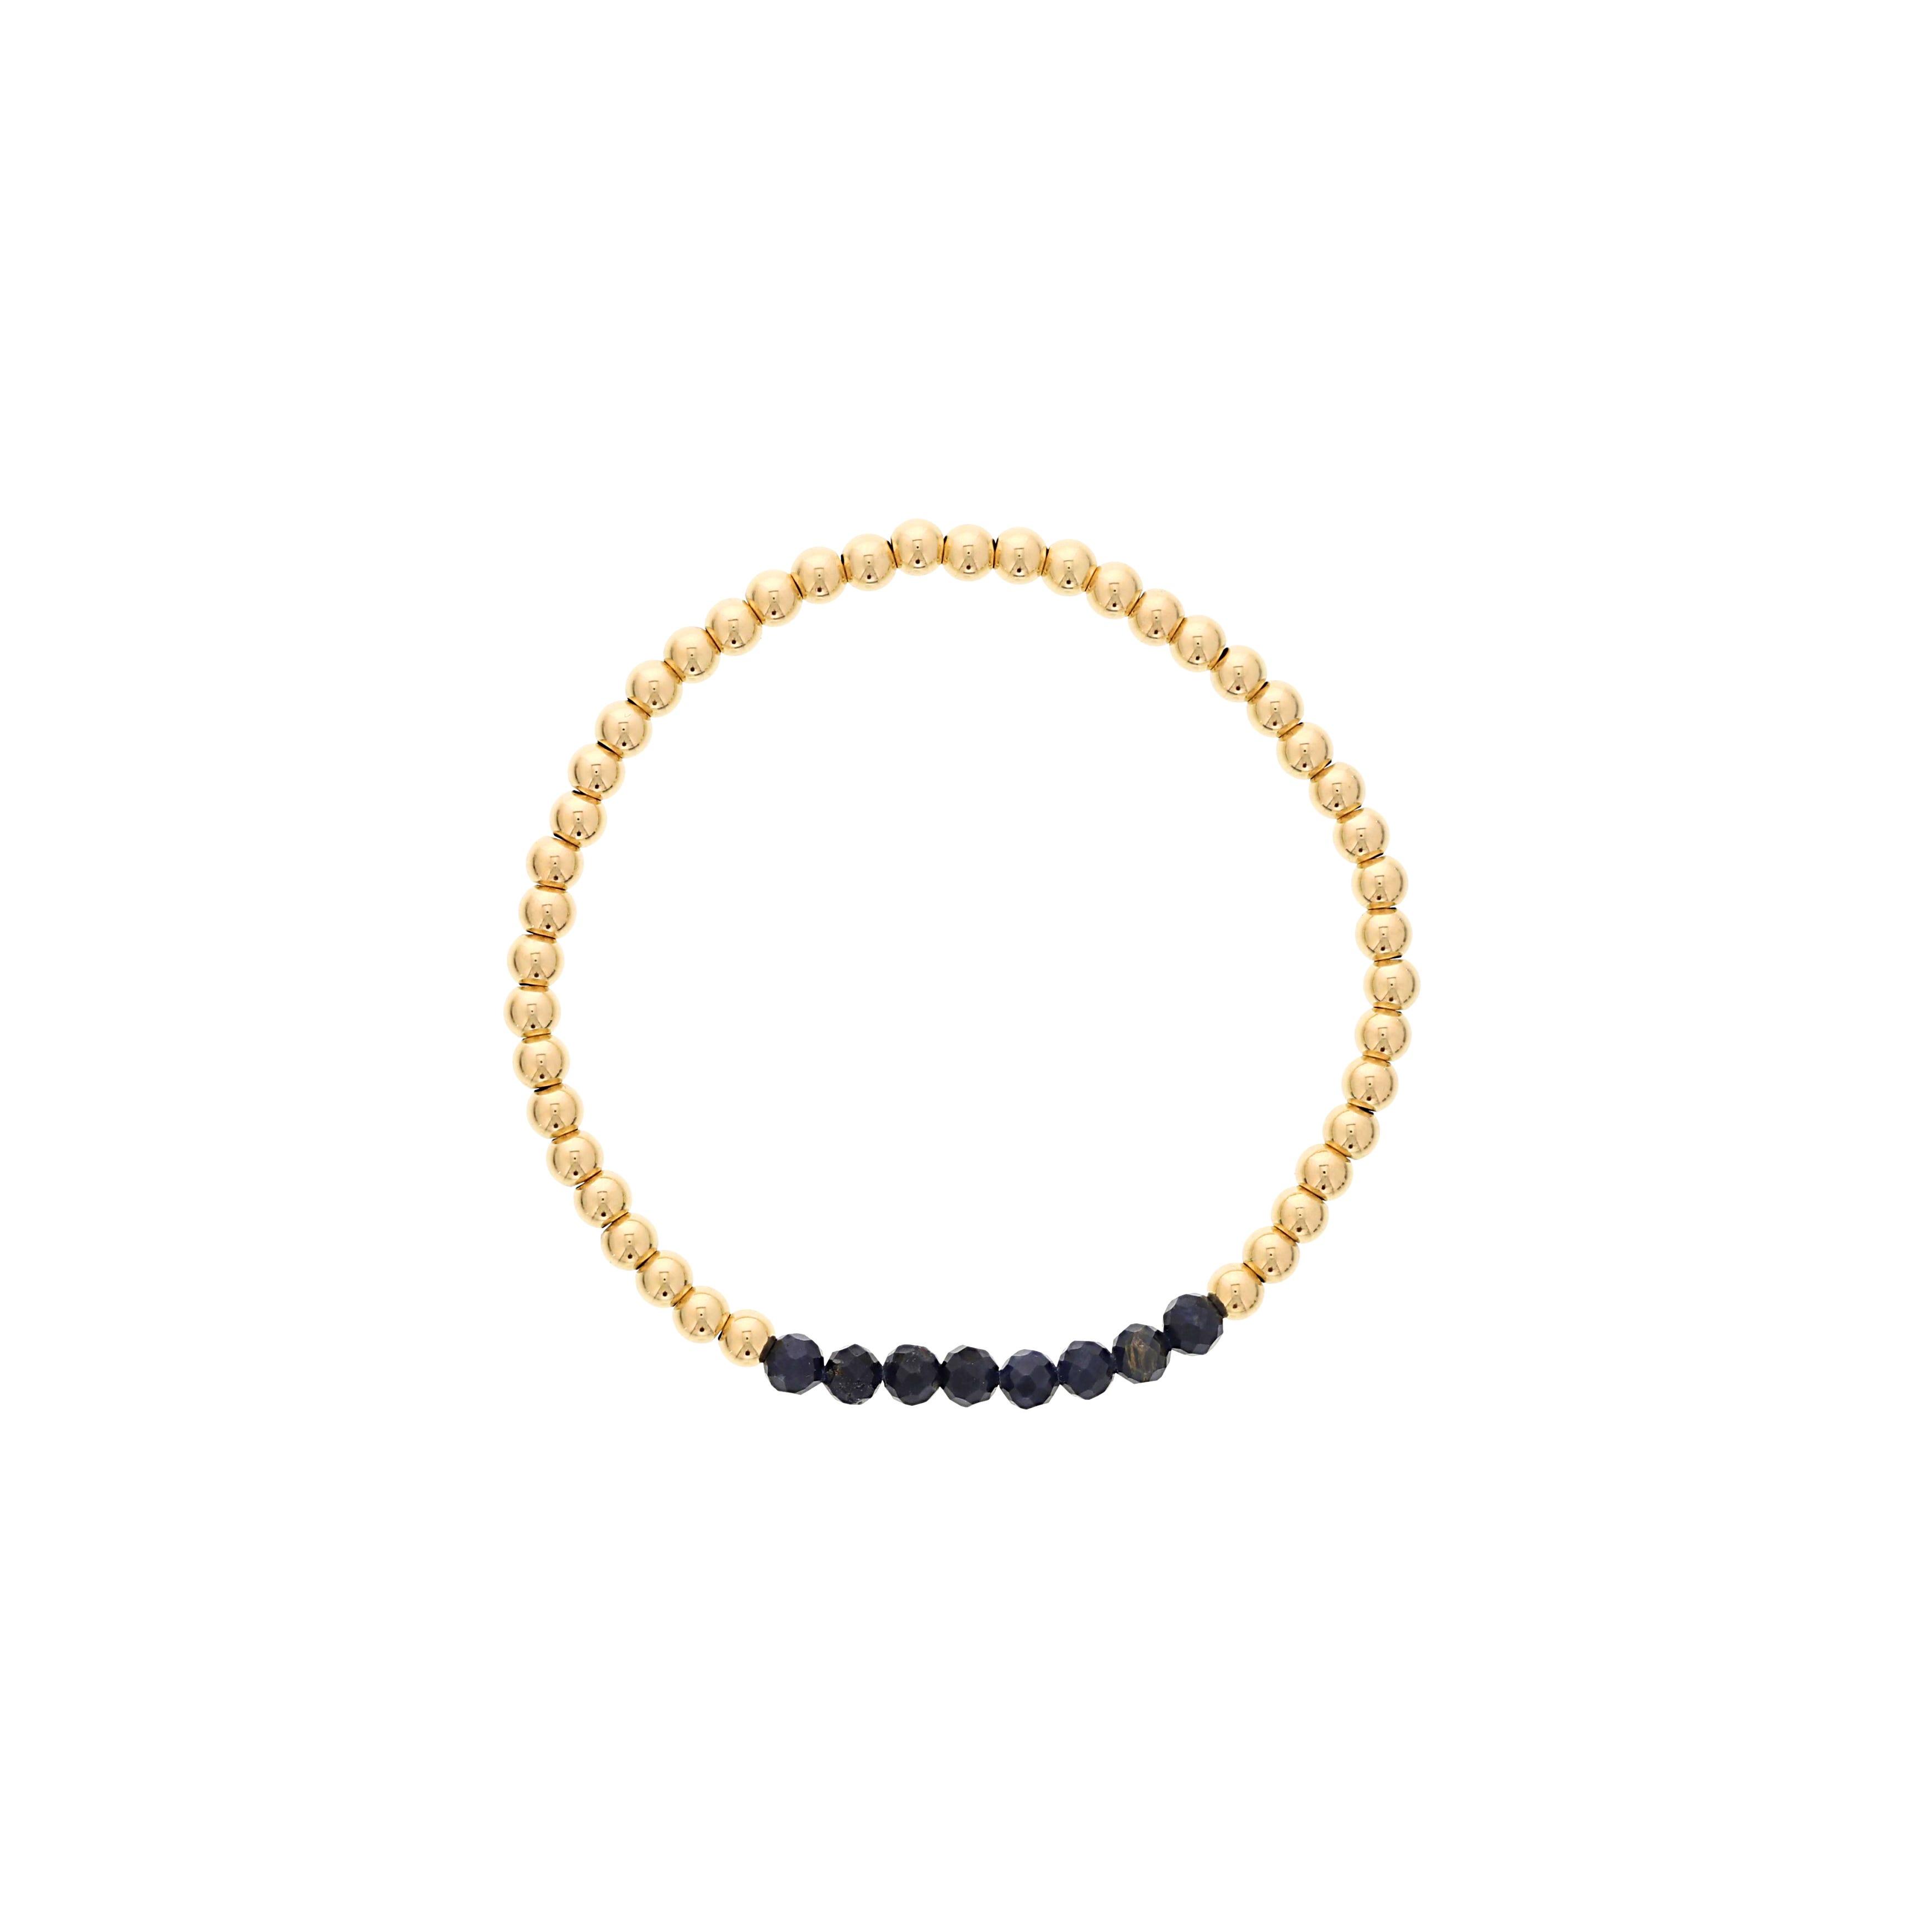 Blue Sapphire Birthstone Beaded Bracelet Gold Filled